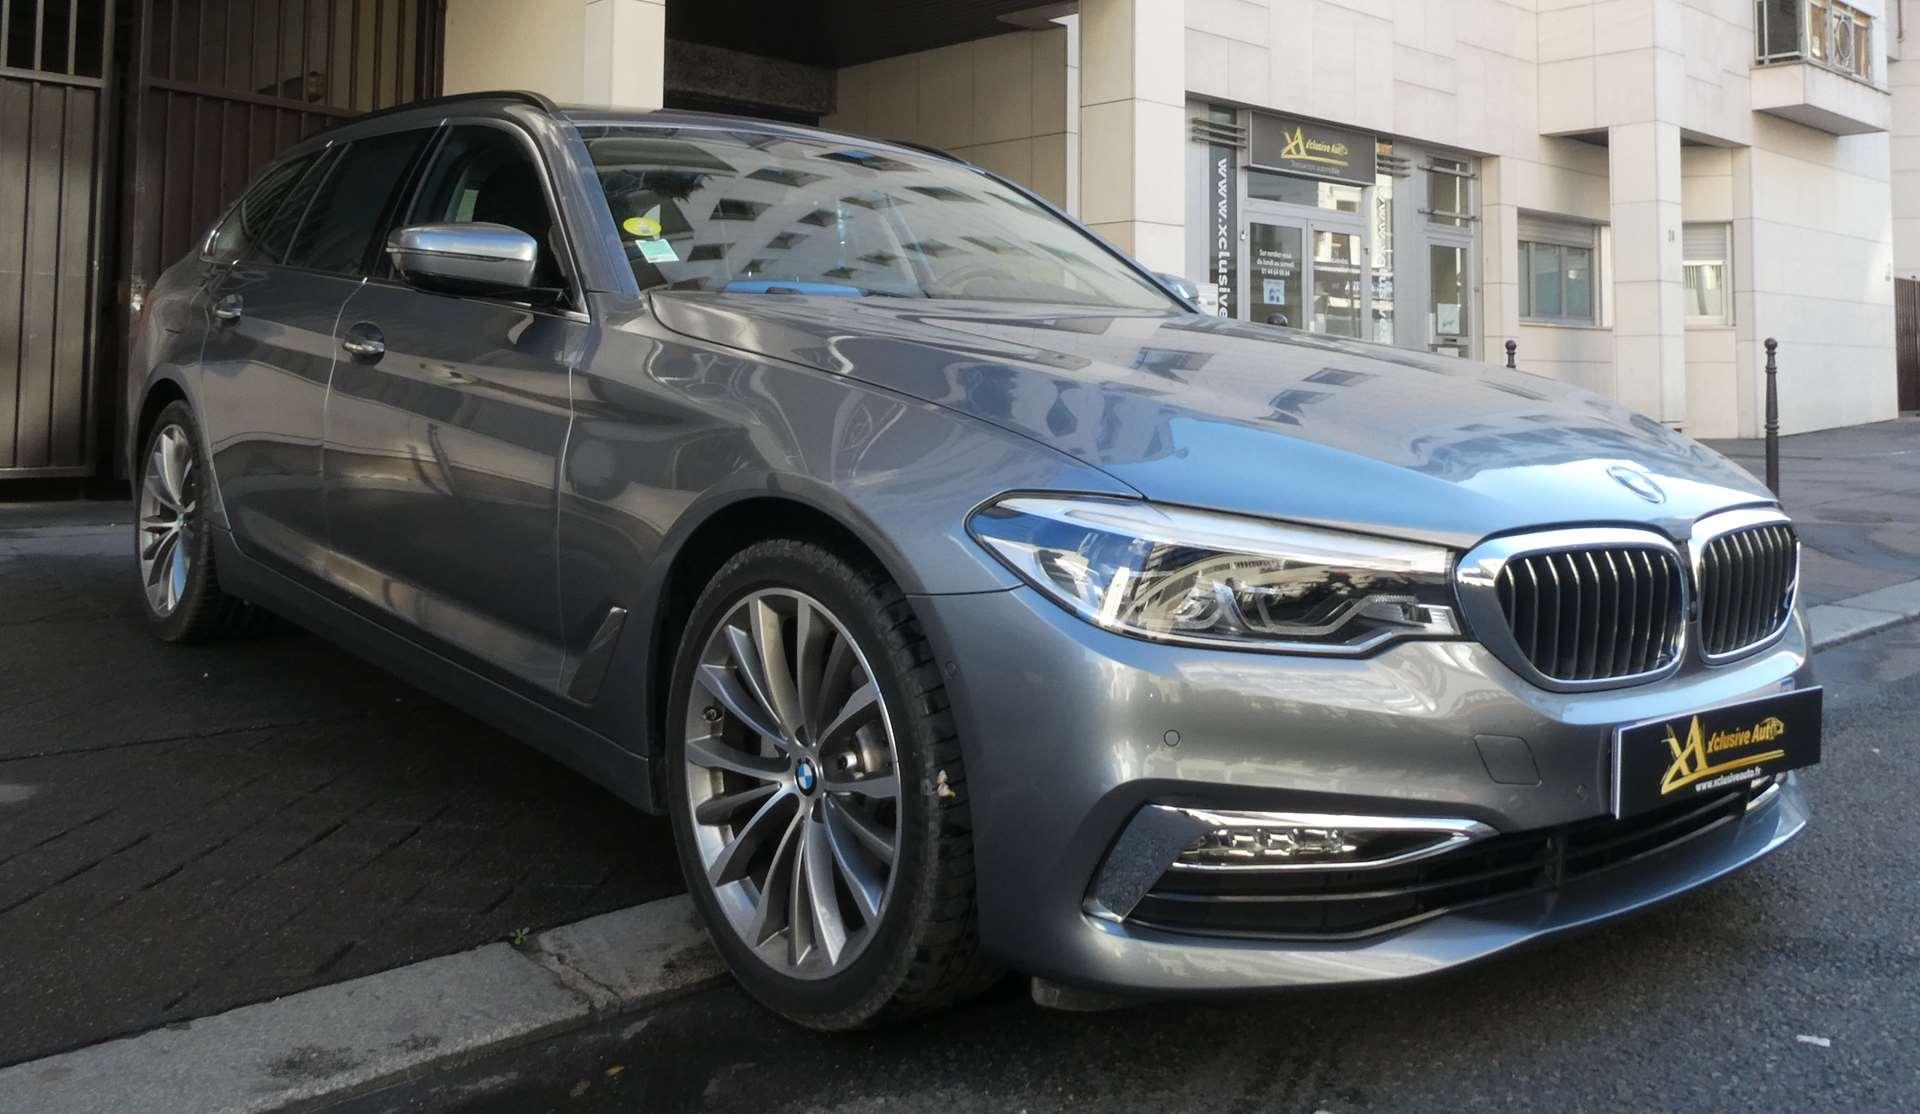 BMW SERIE 5 (G31) TOURING 520DA XDRIVE 190 LUXURY